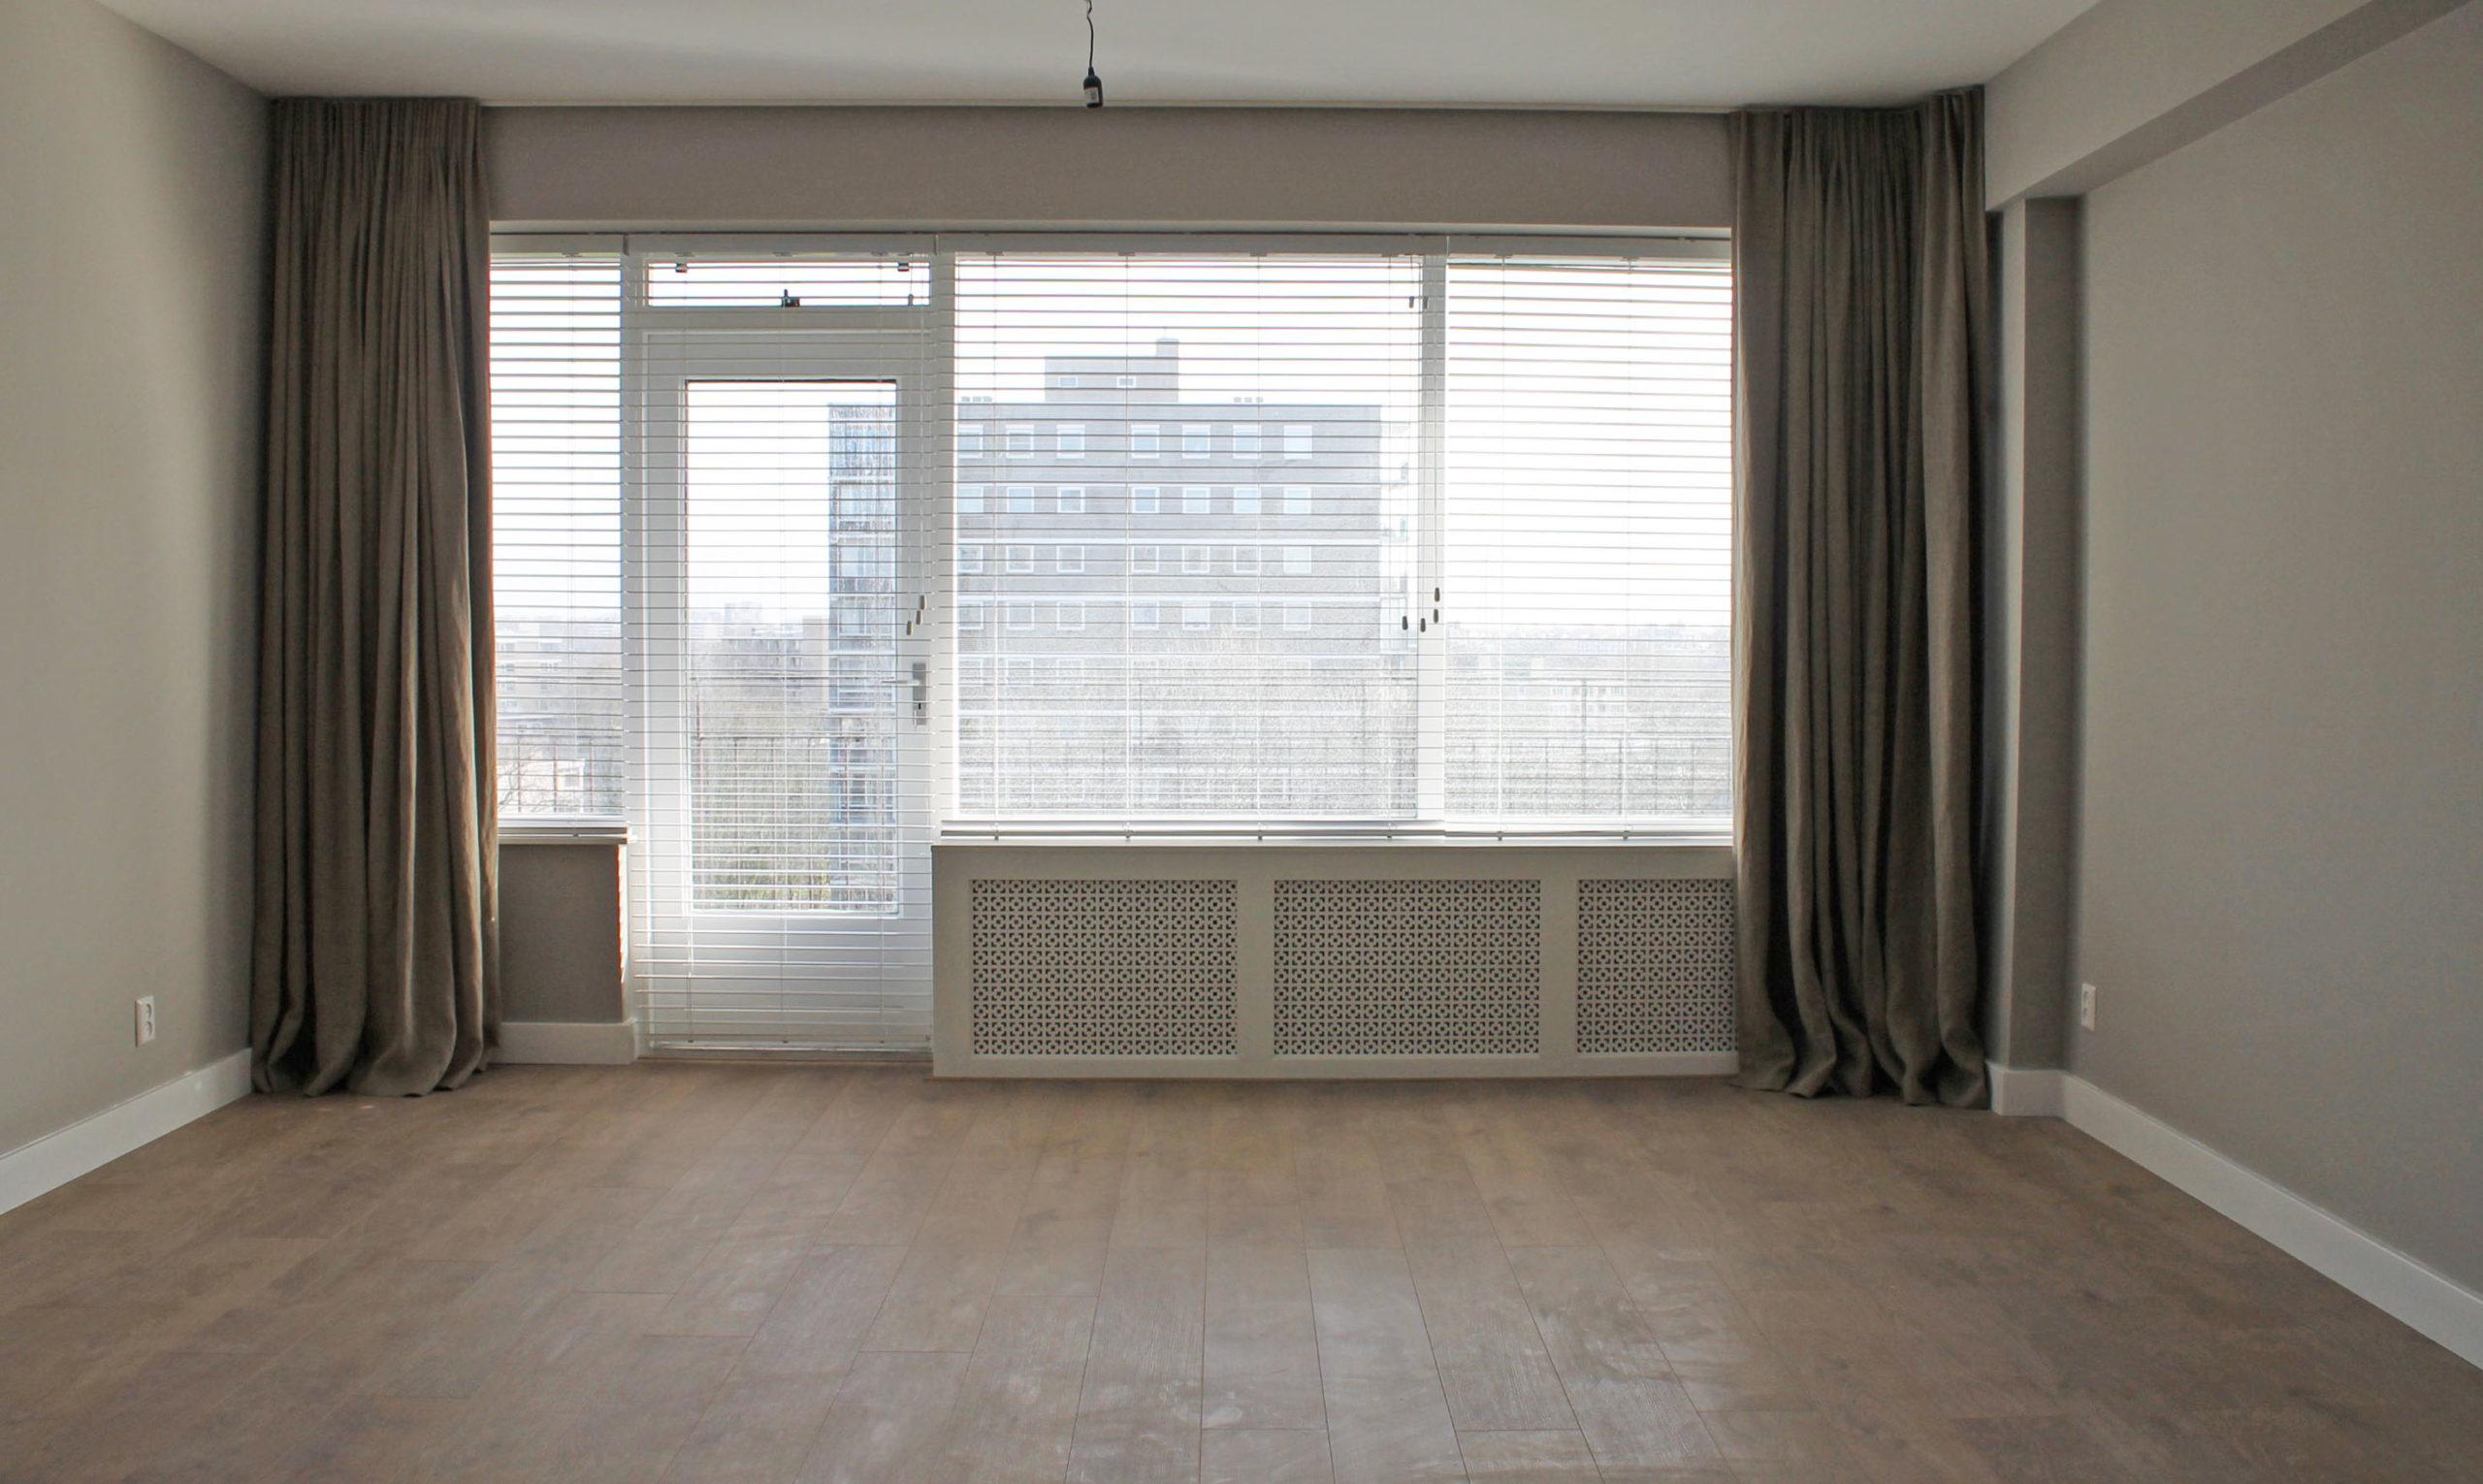 Interior design for apartment the Hague by Frederik Premier Interior Creators